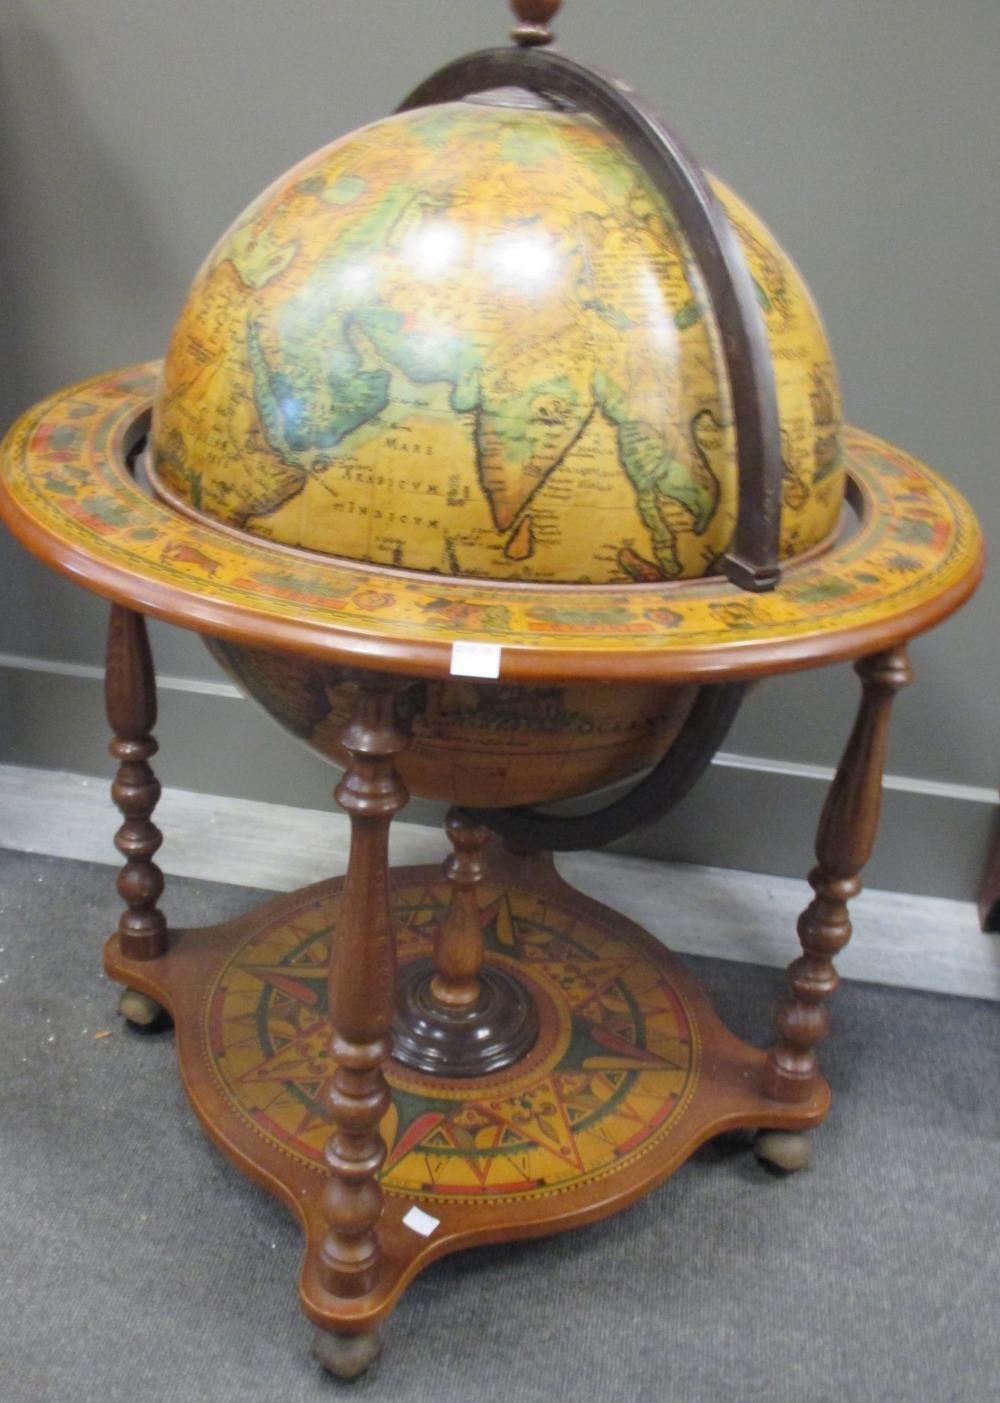 Lot 542 - A Terrestrial globe drinks cabinet - A Terrestrial Globe Drinks Cabinet